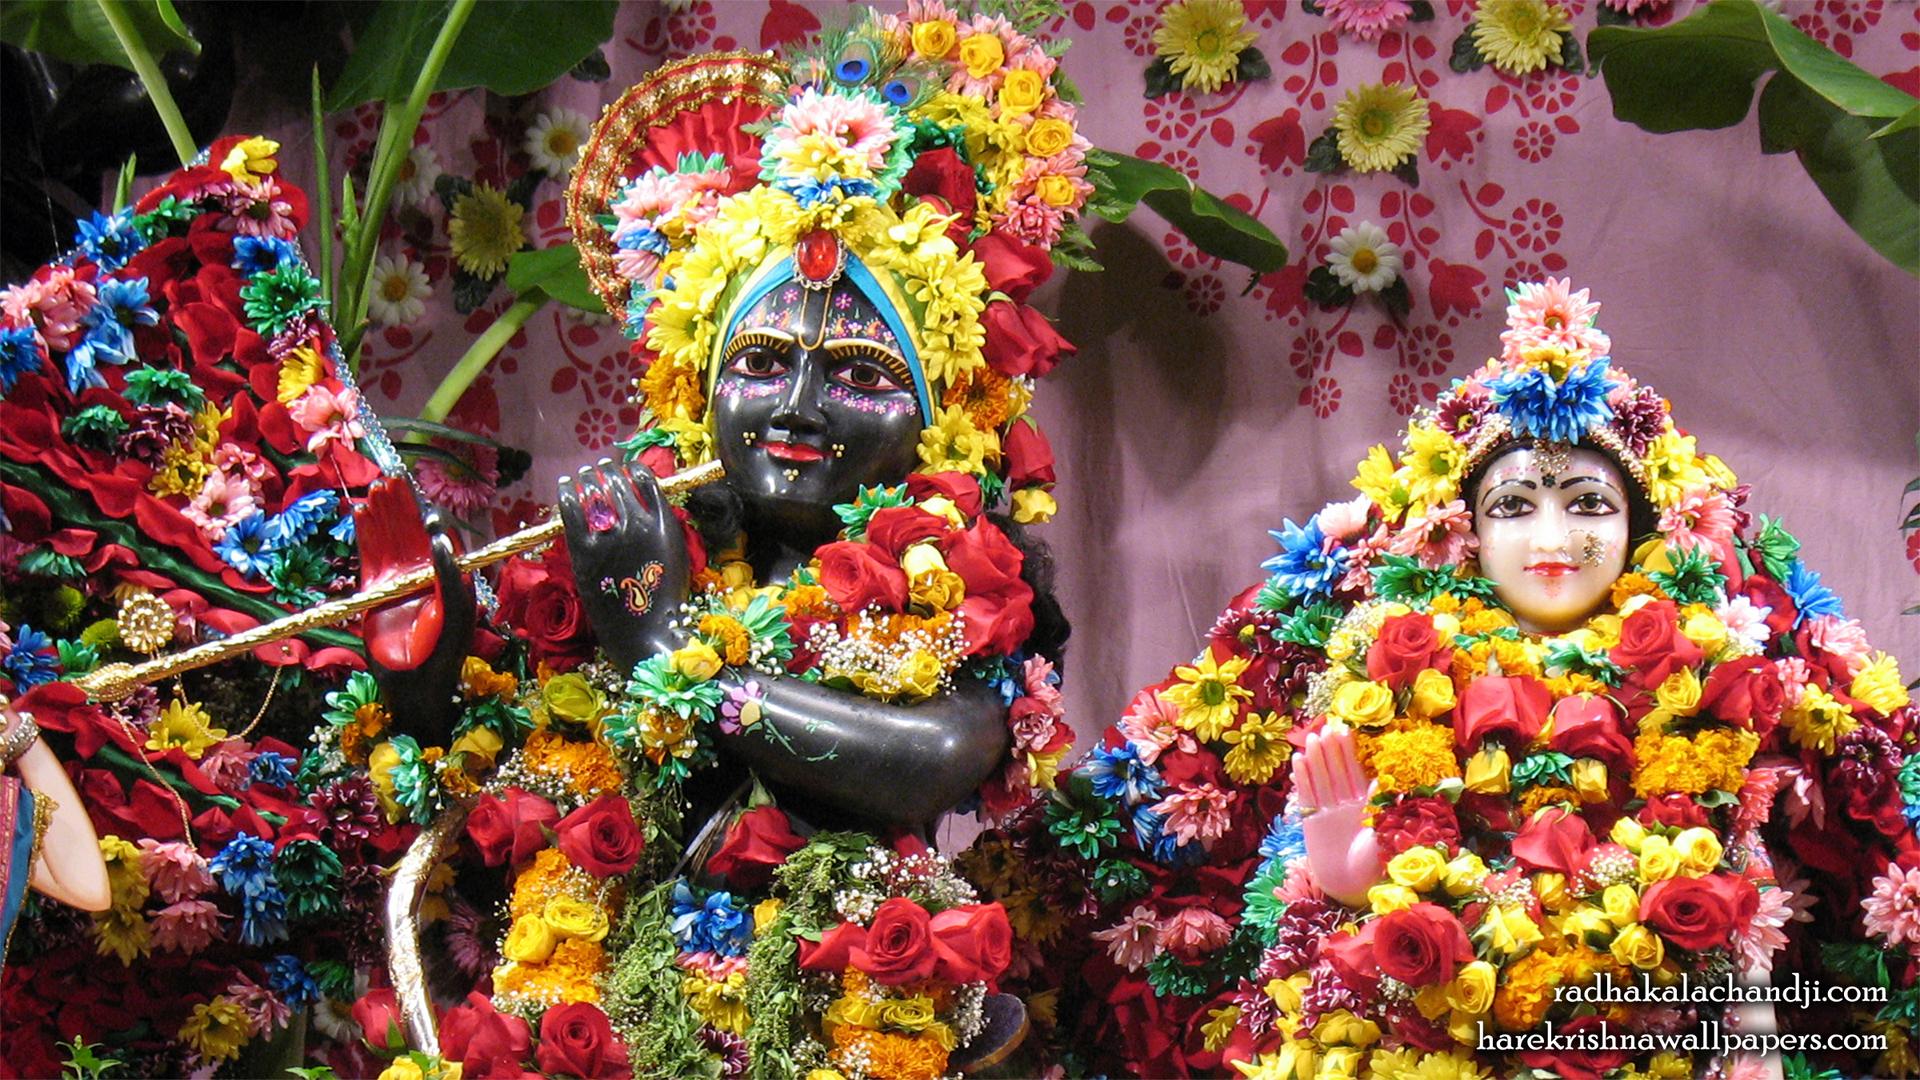 Sri Sri Radha Kalachanda Close up Wallpaper (001) Size 1920x1080 Download